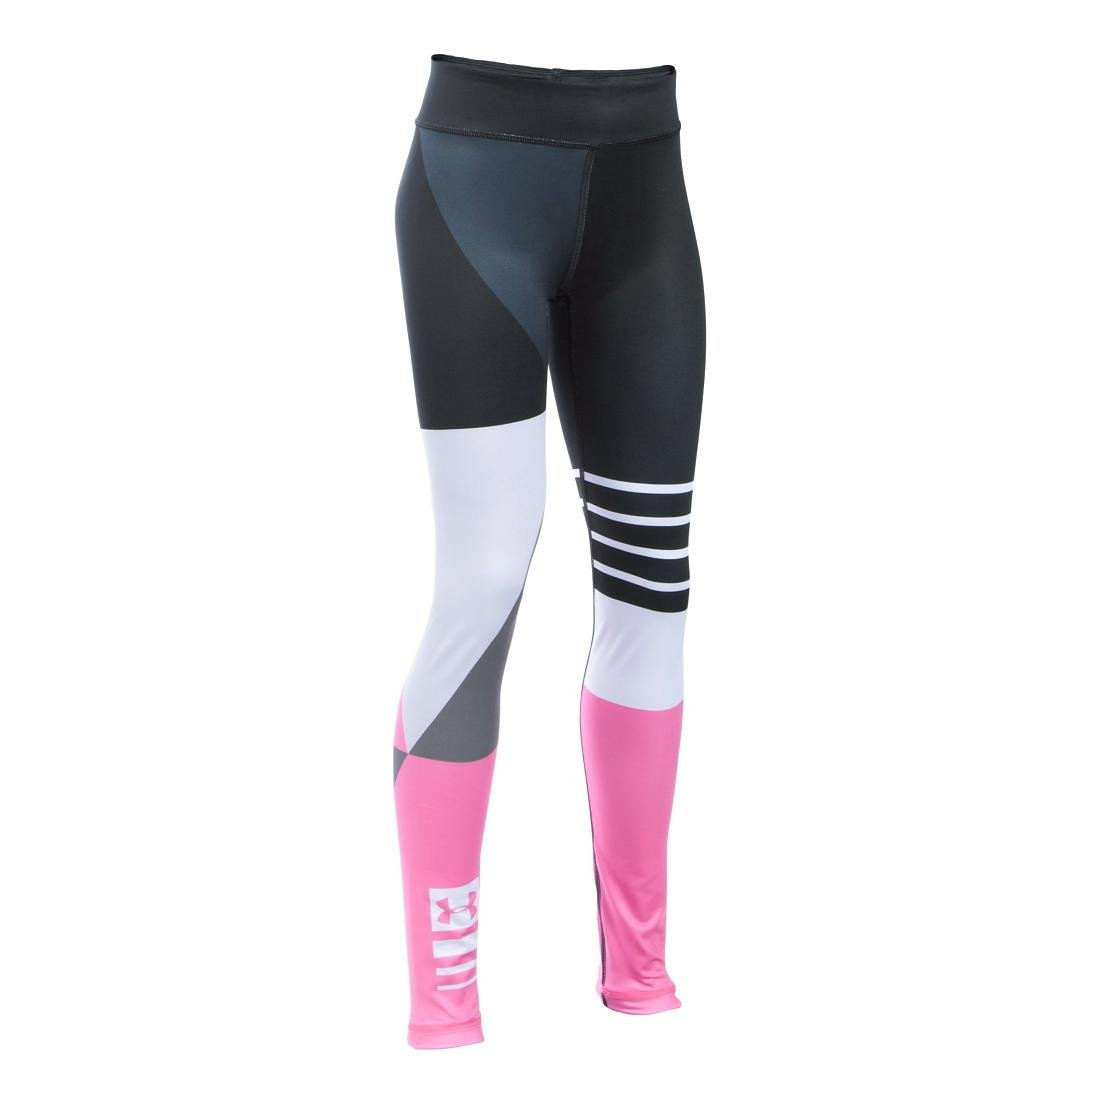 b6b47b0e7d0047 Amazon.com : Under Armour Girls' Mix Master Legging : Sports & Outdoors